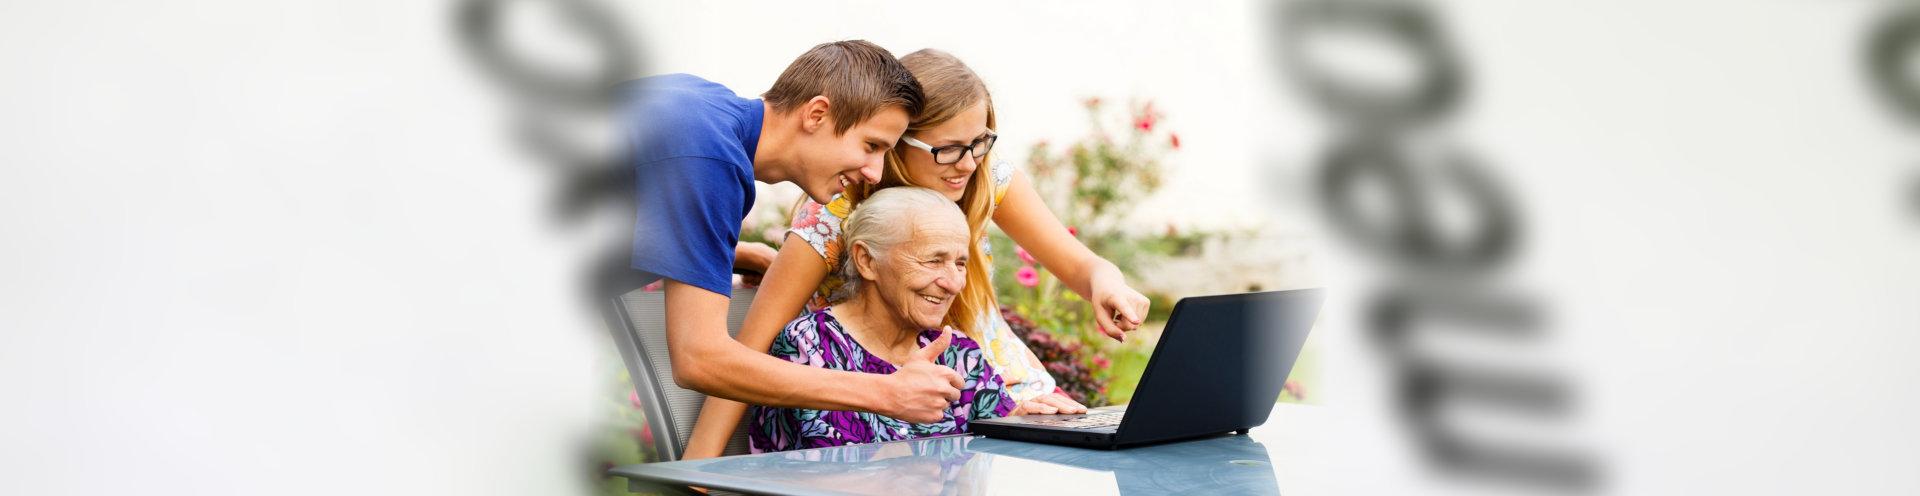 caregiver assisting elderly patient